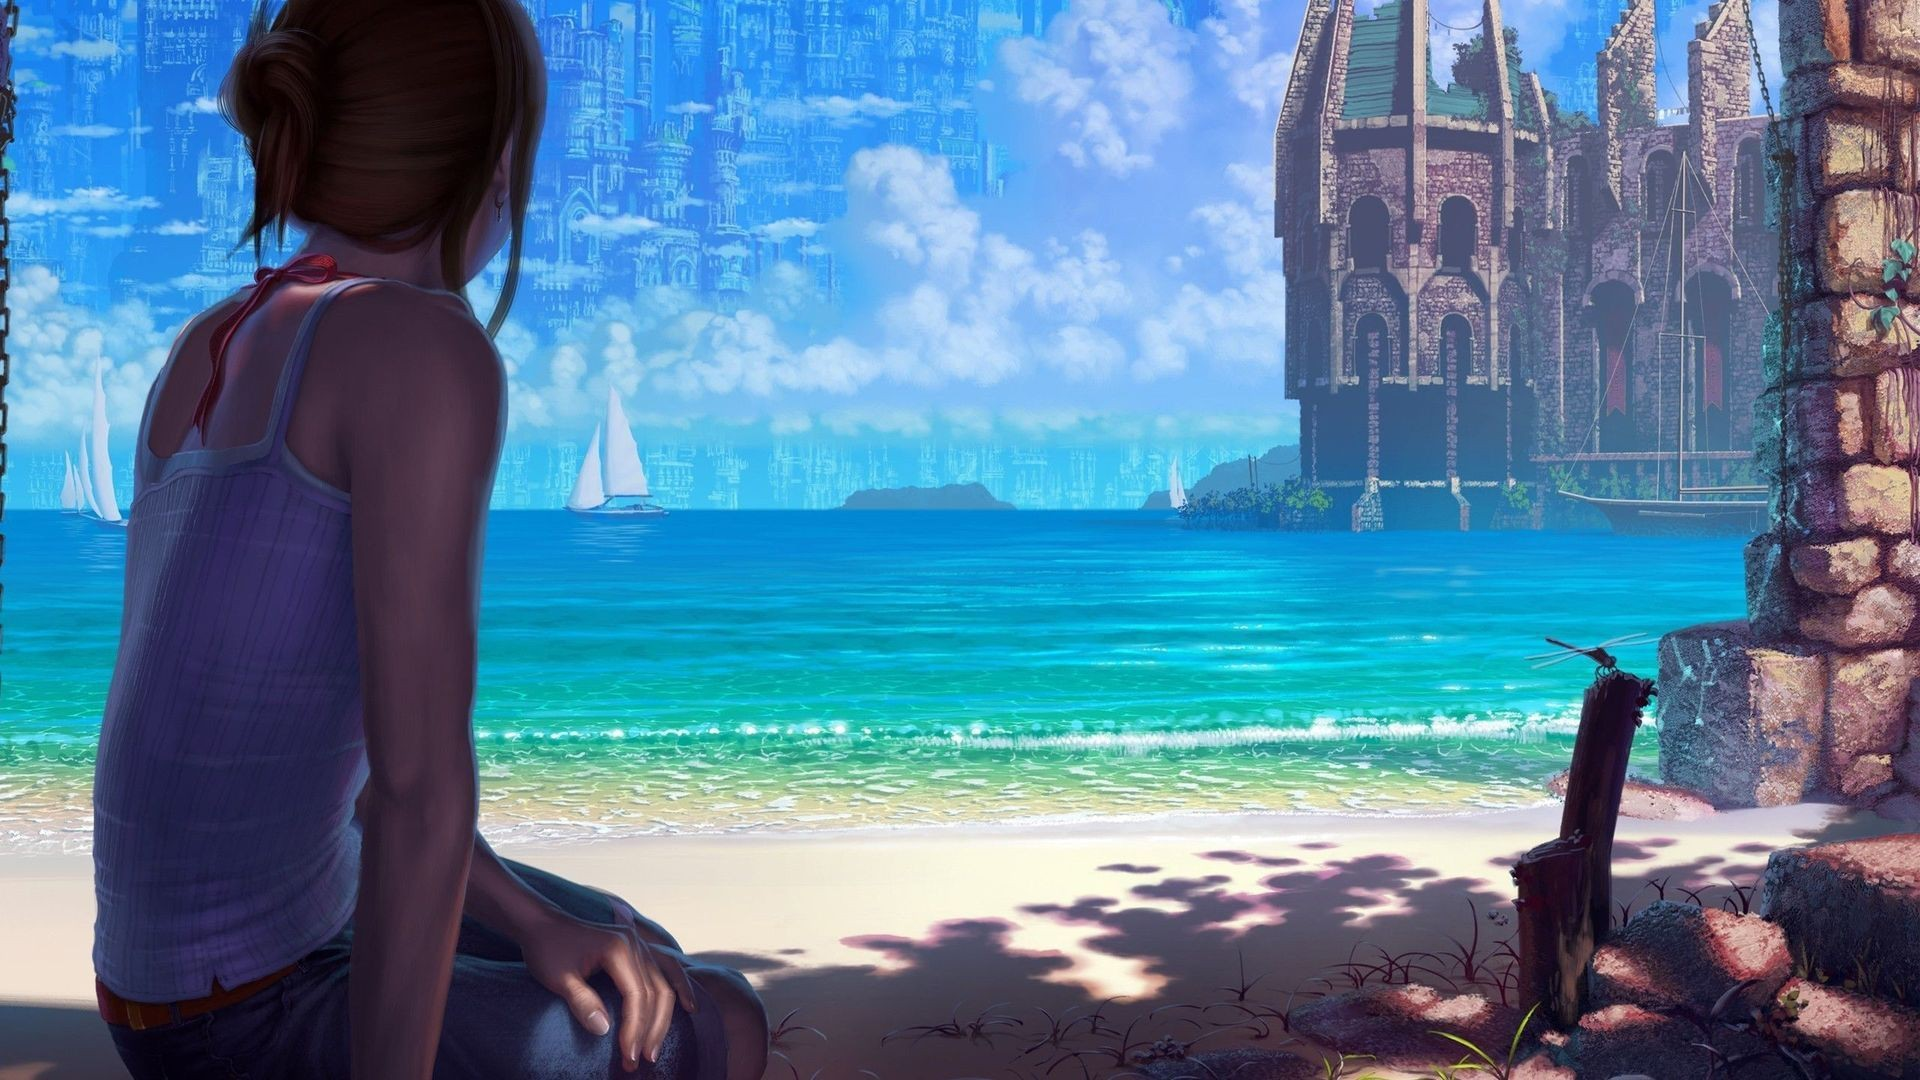 Anime Beach Image